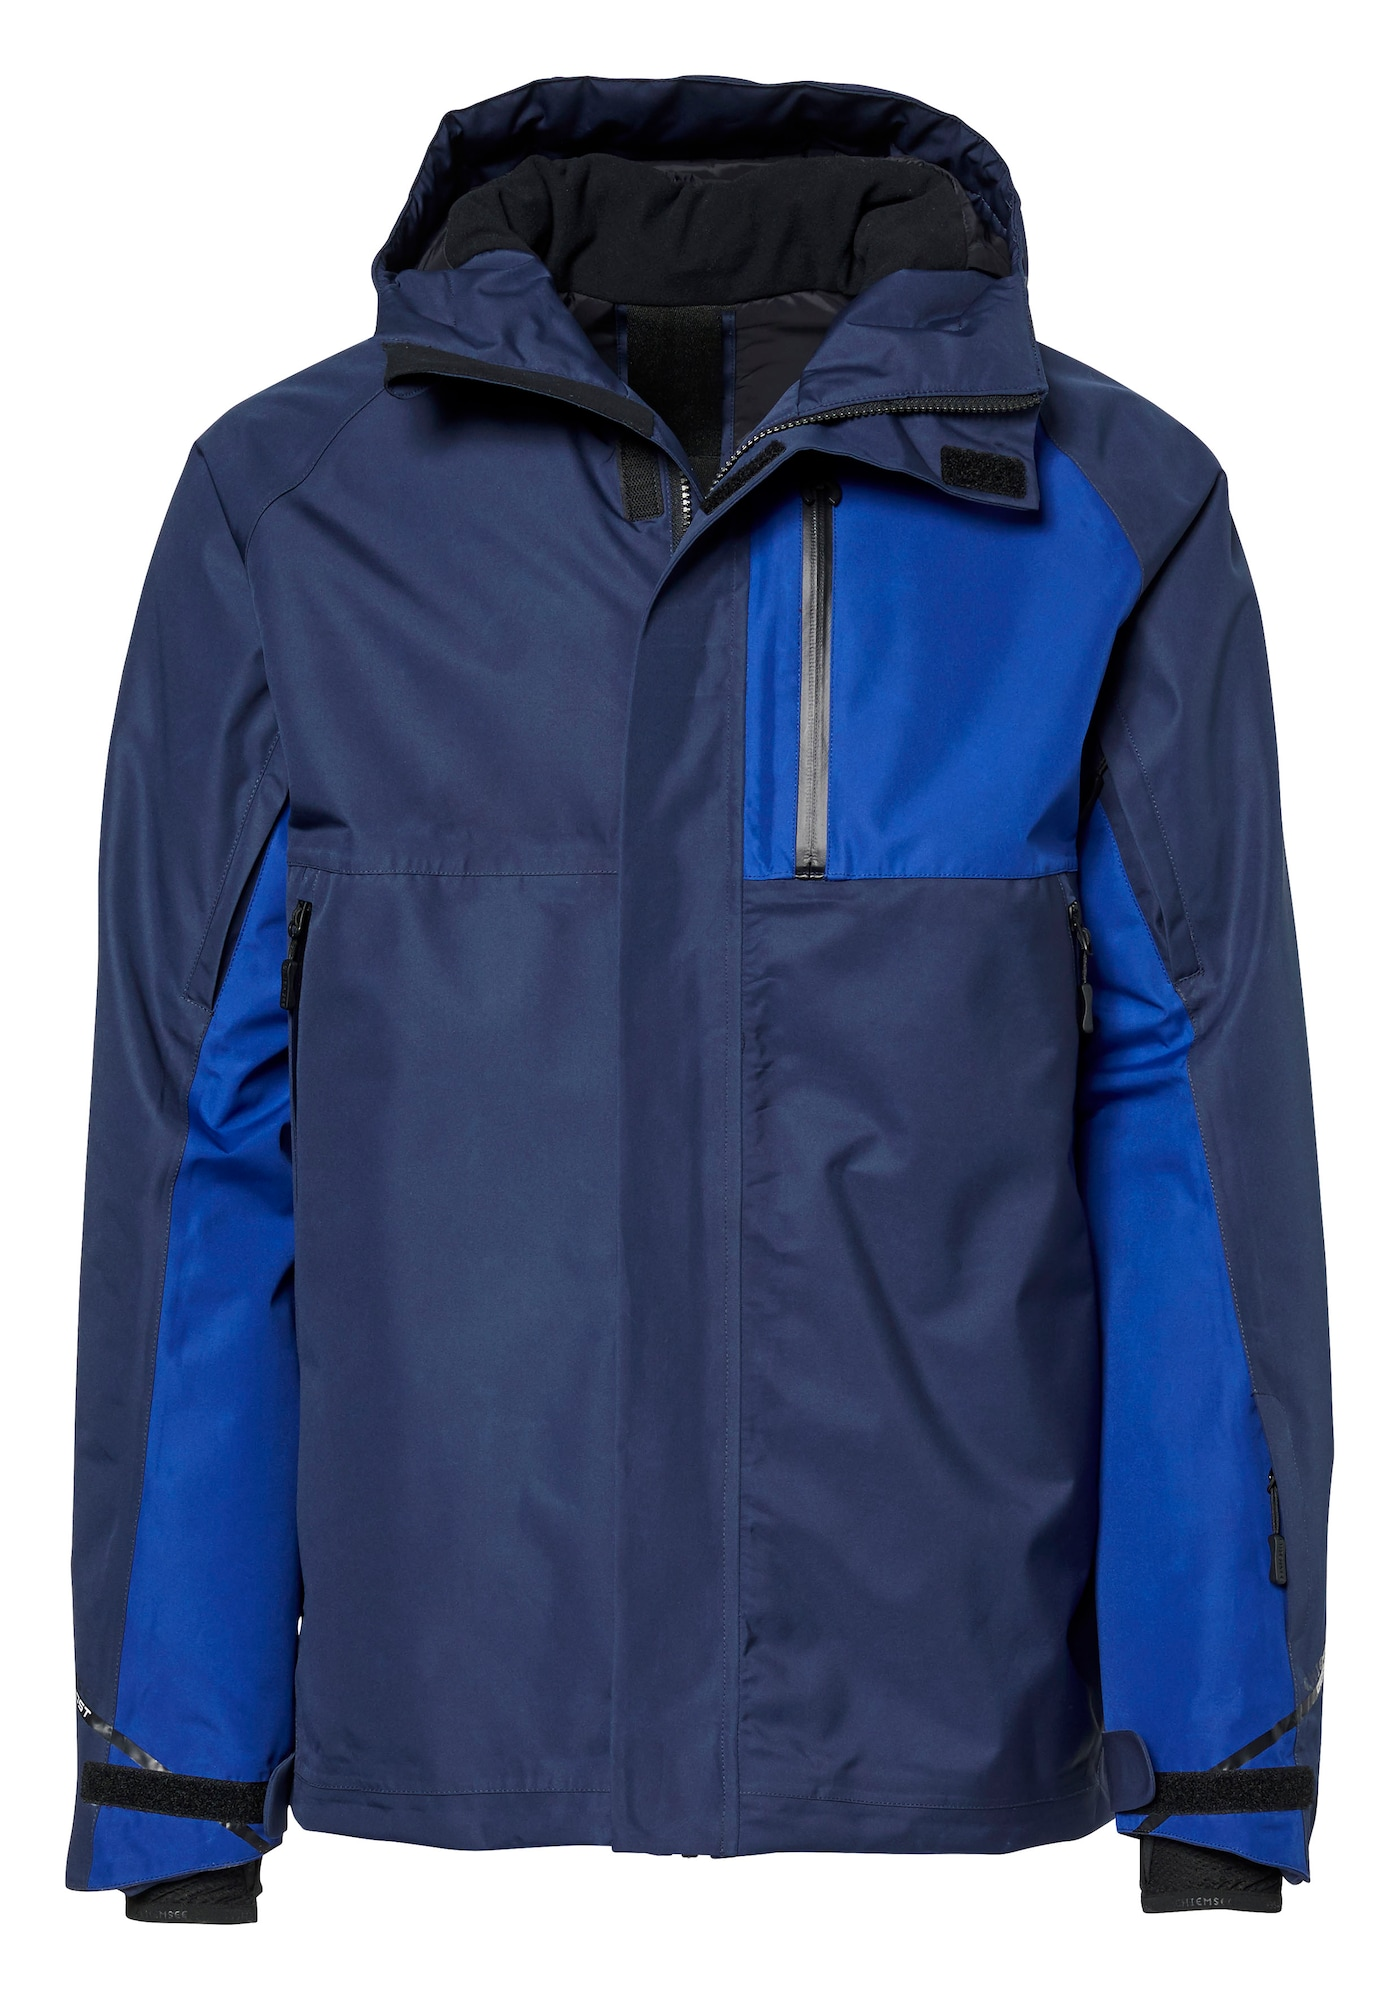 CHIEMSEE Outdoorová bunda 'ROCKY MOUNTAINS Ski Jacket'  modrá